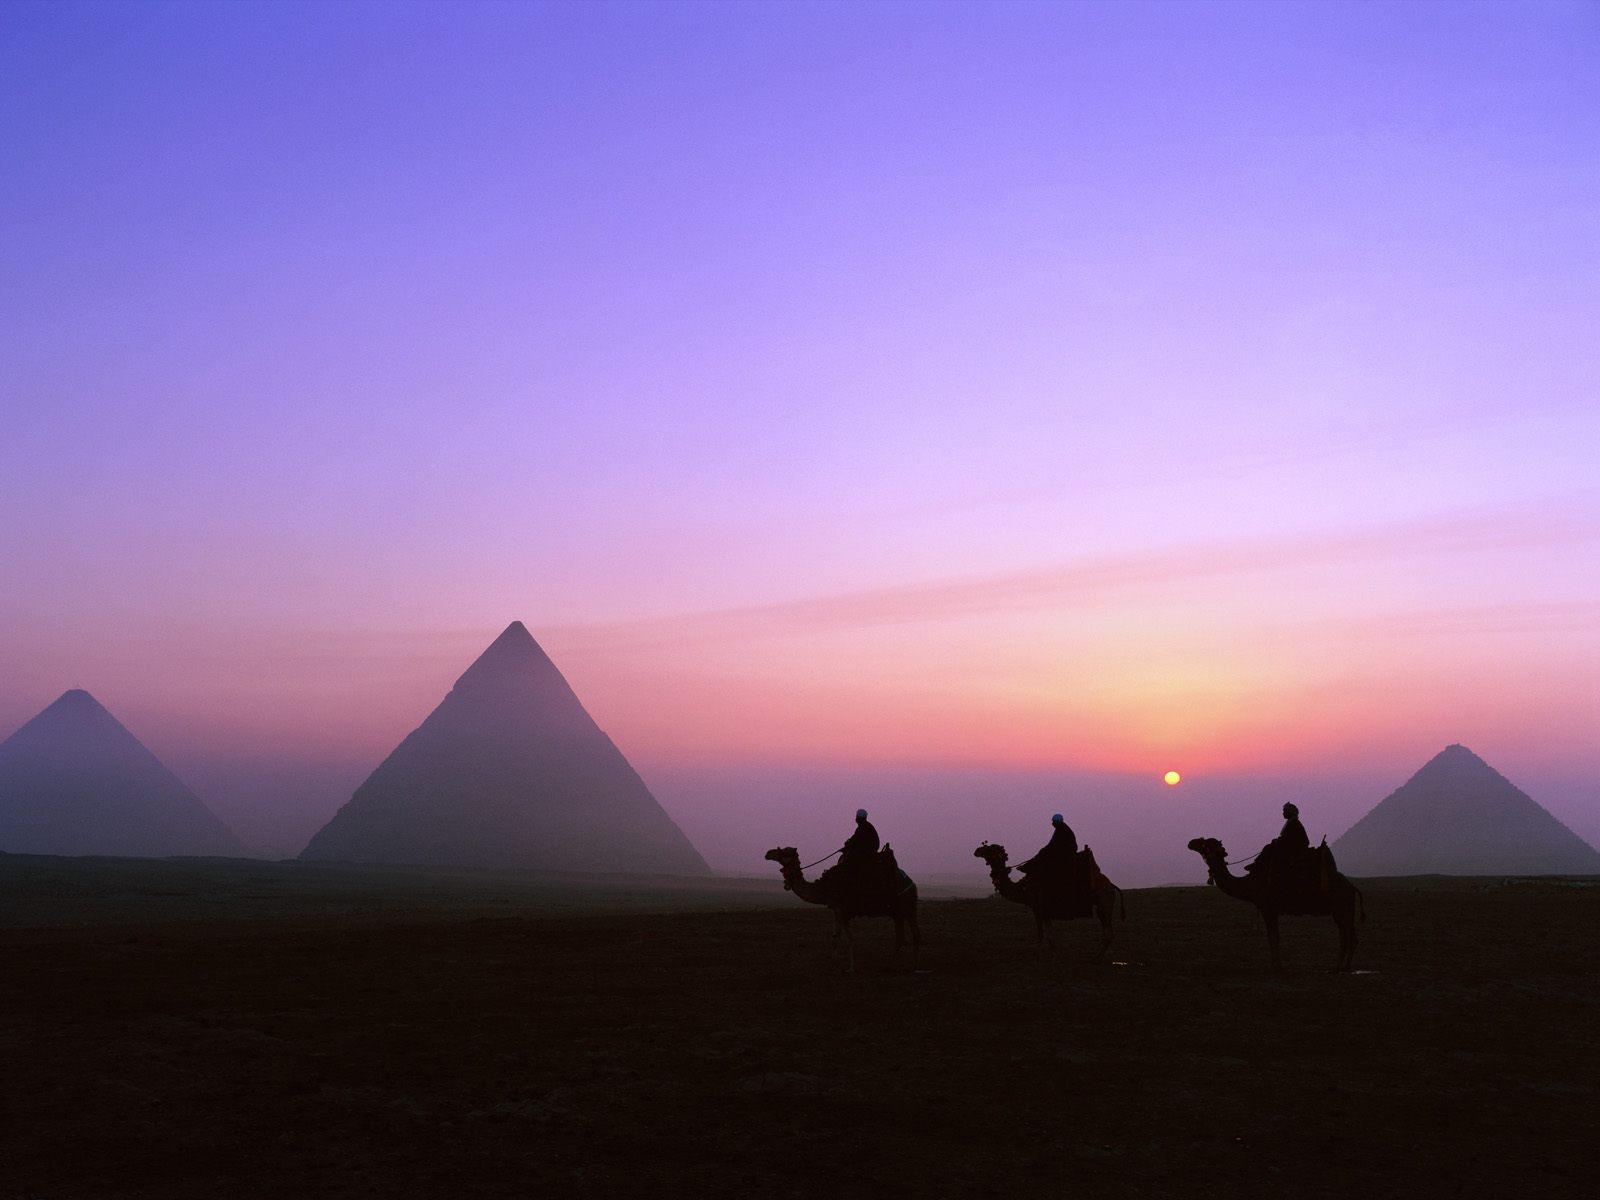 Group Of Pyramids Wallpaper